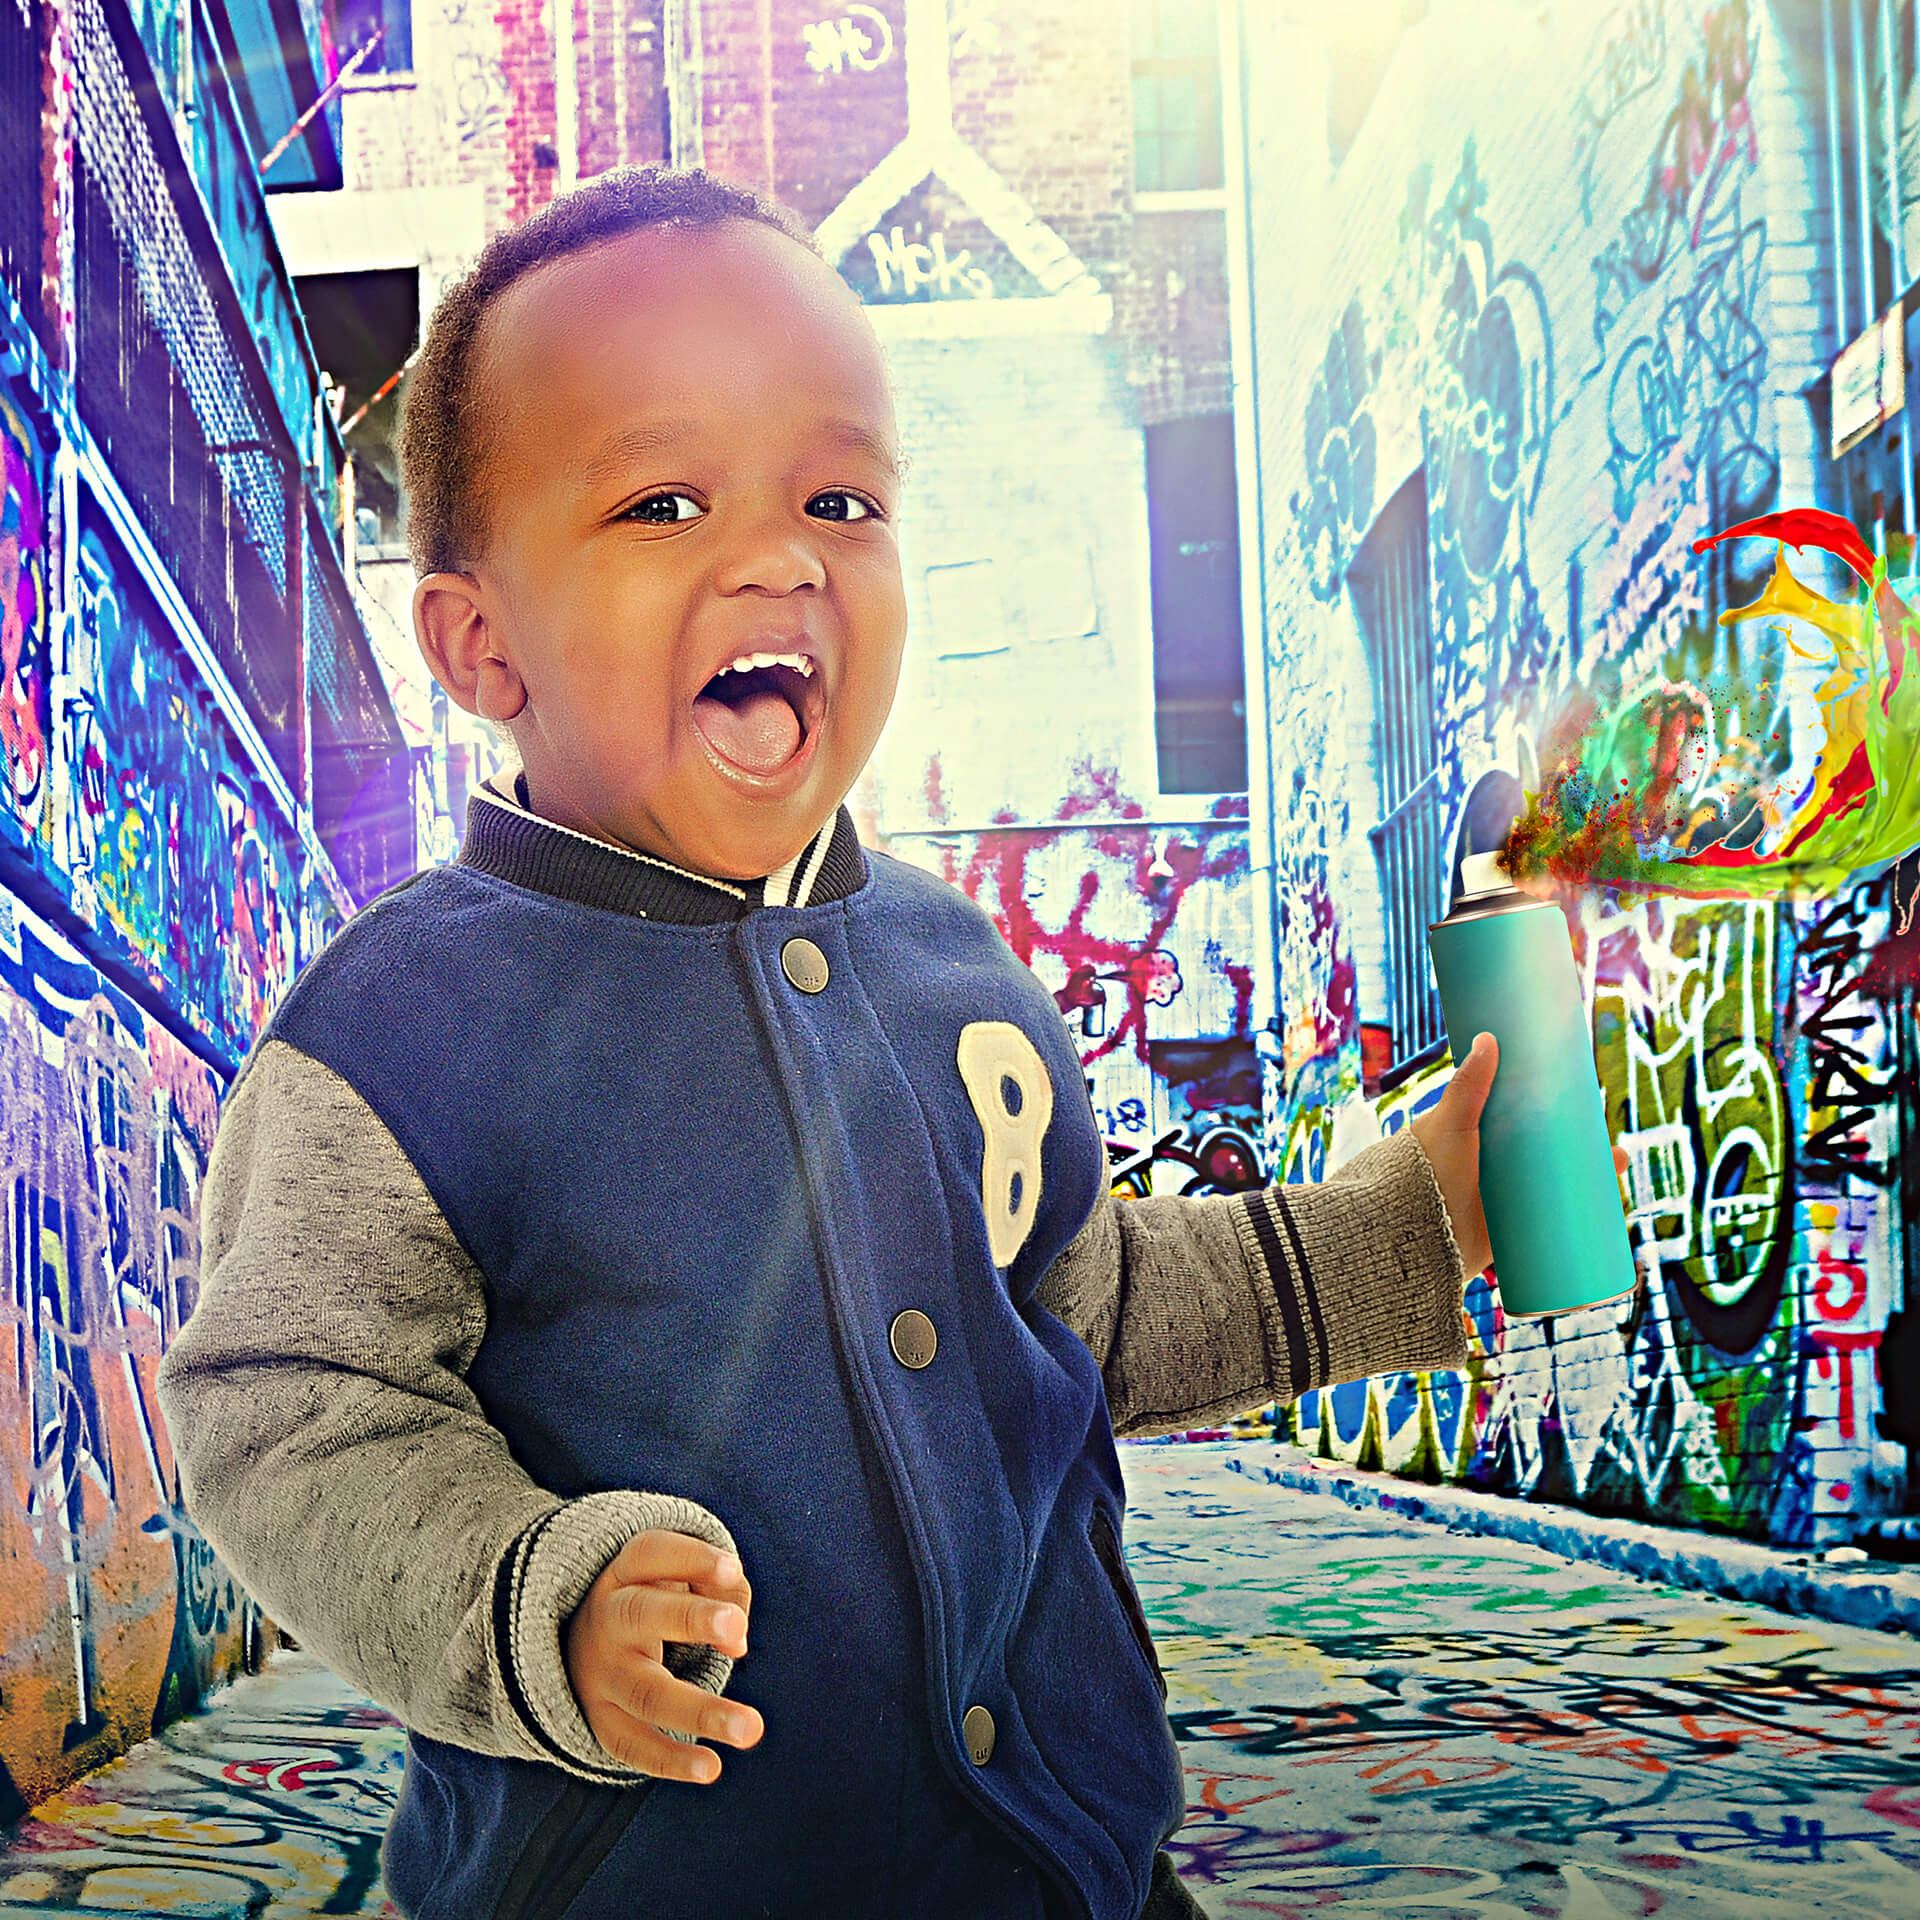 kids photoshoots 5 northampton kline studios